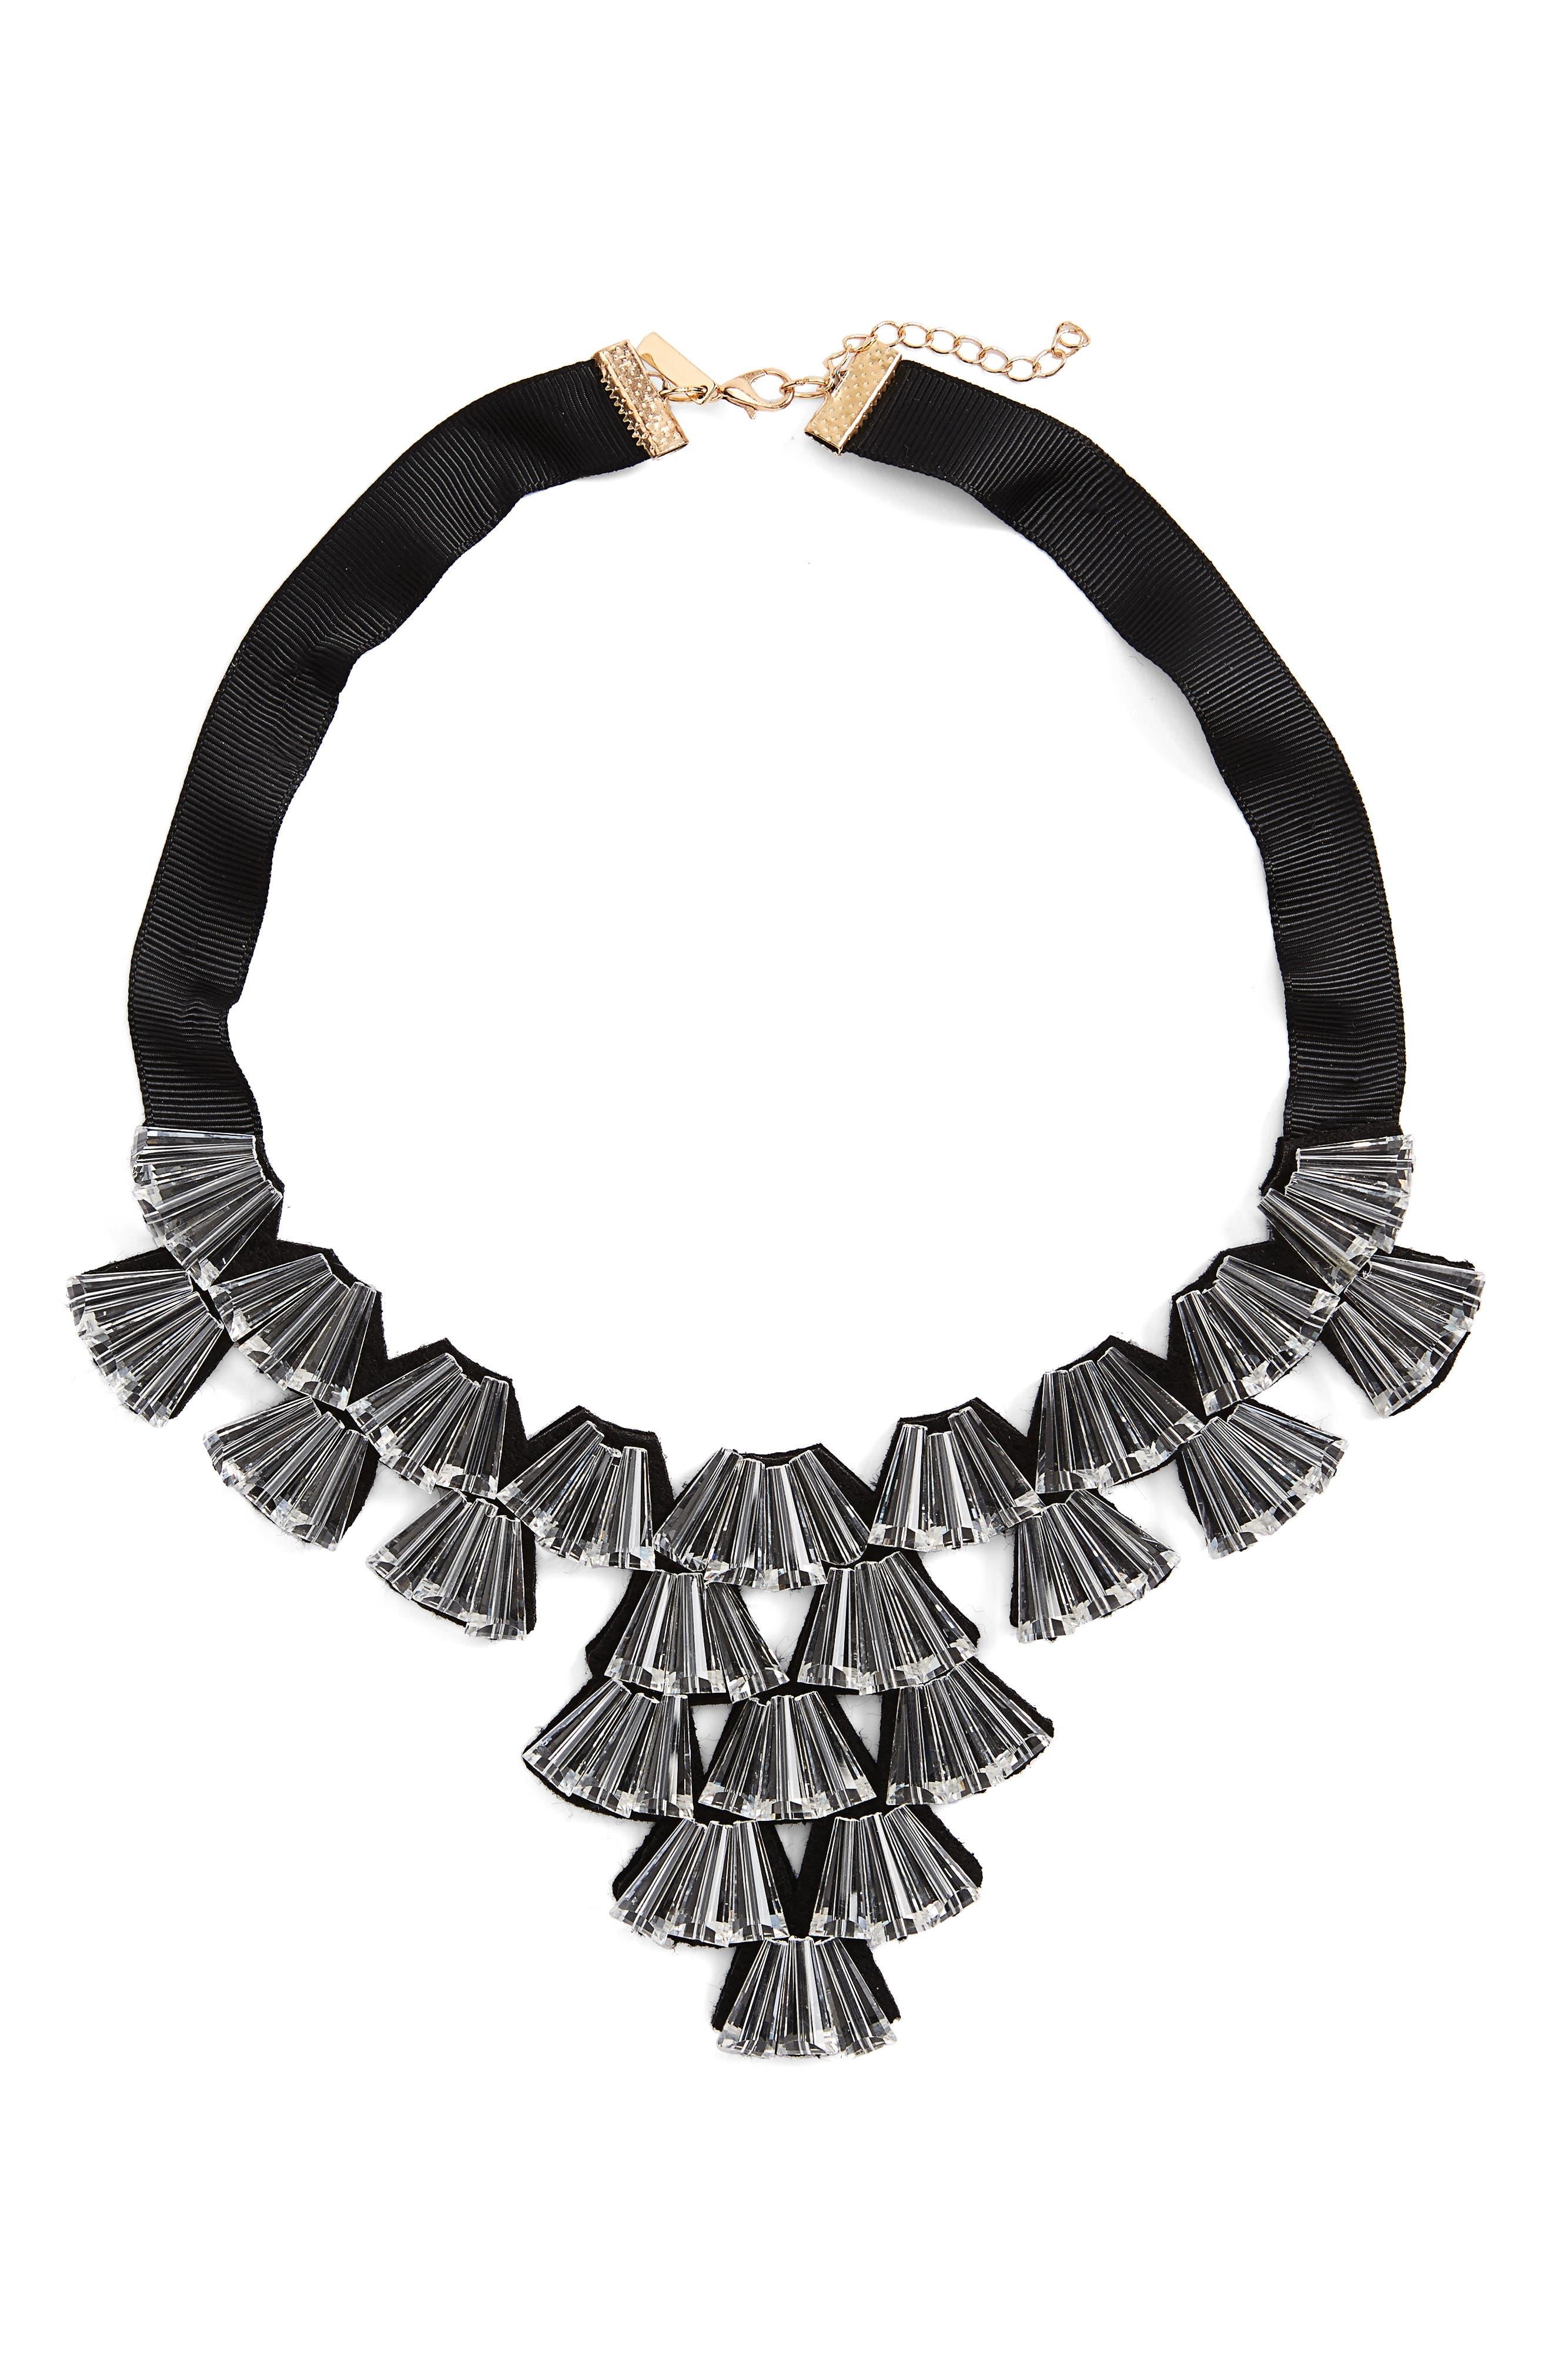 Topshop Crystal Fan Collar Necklace